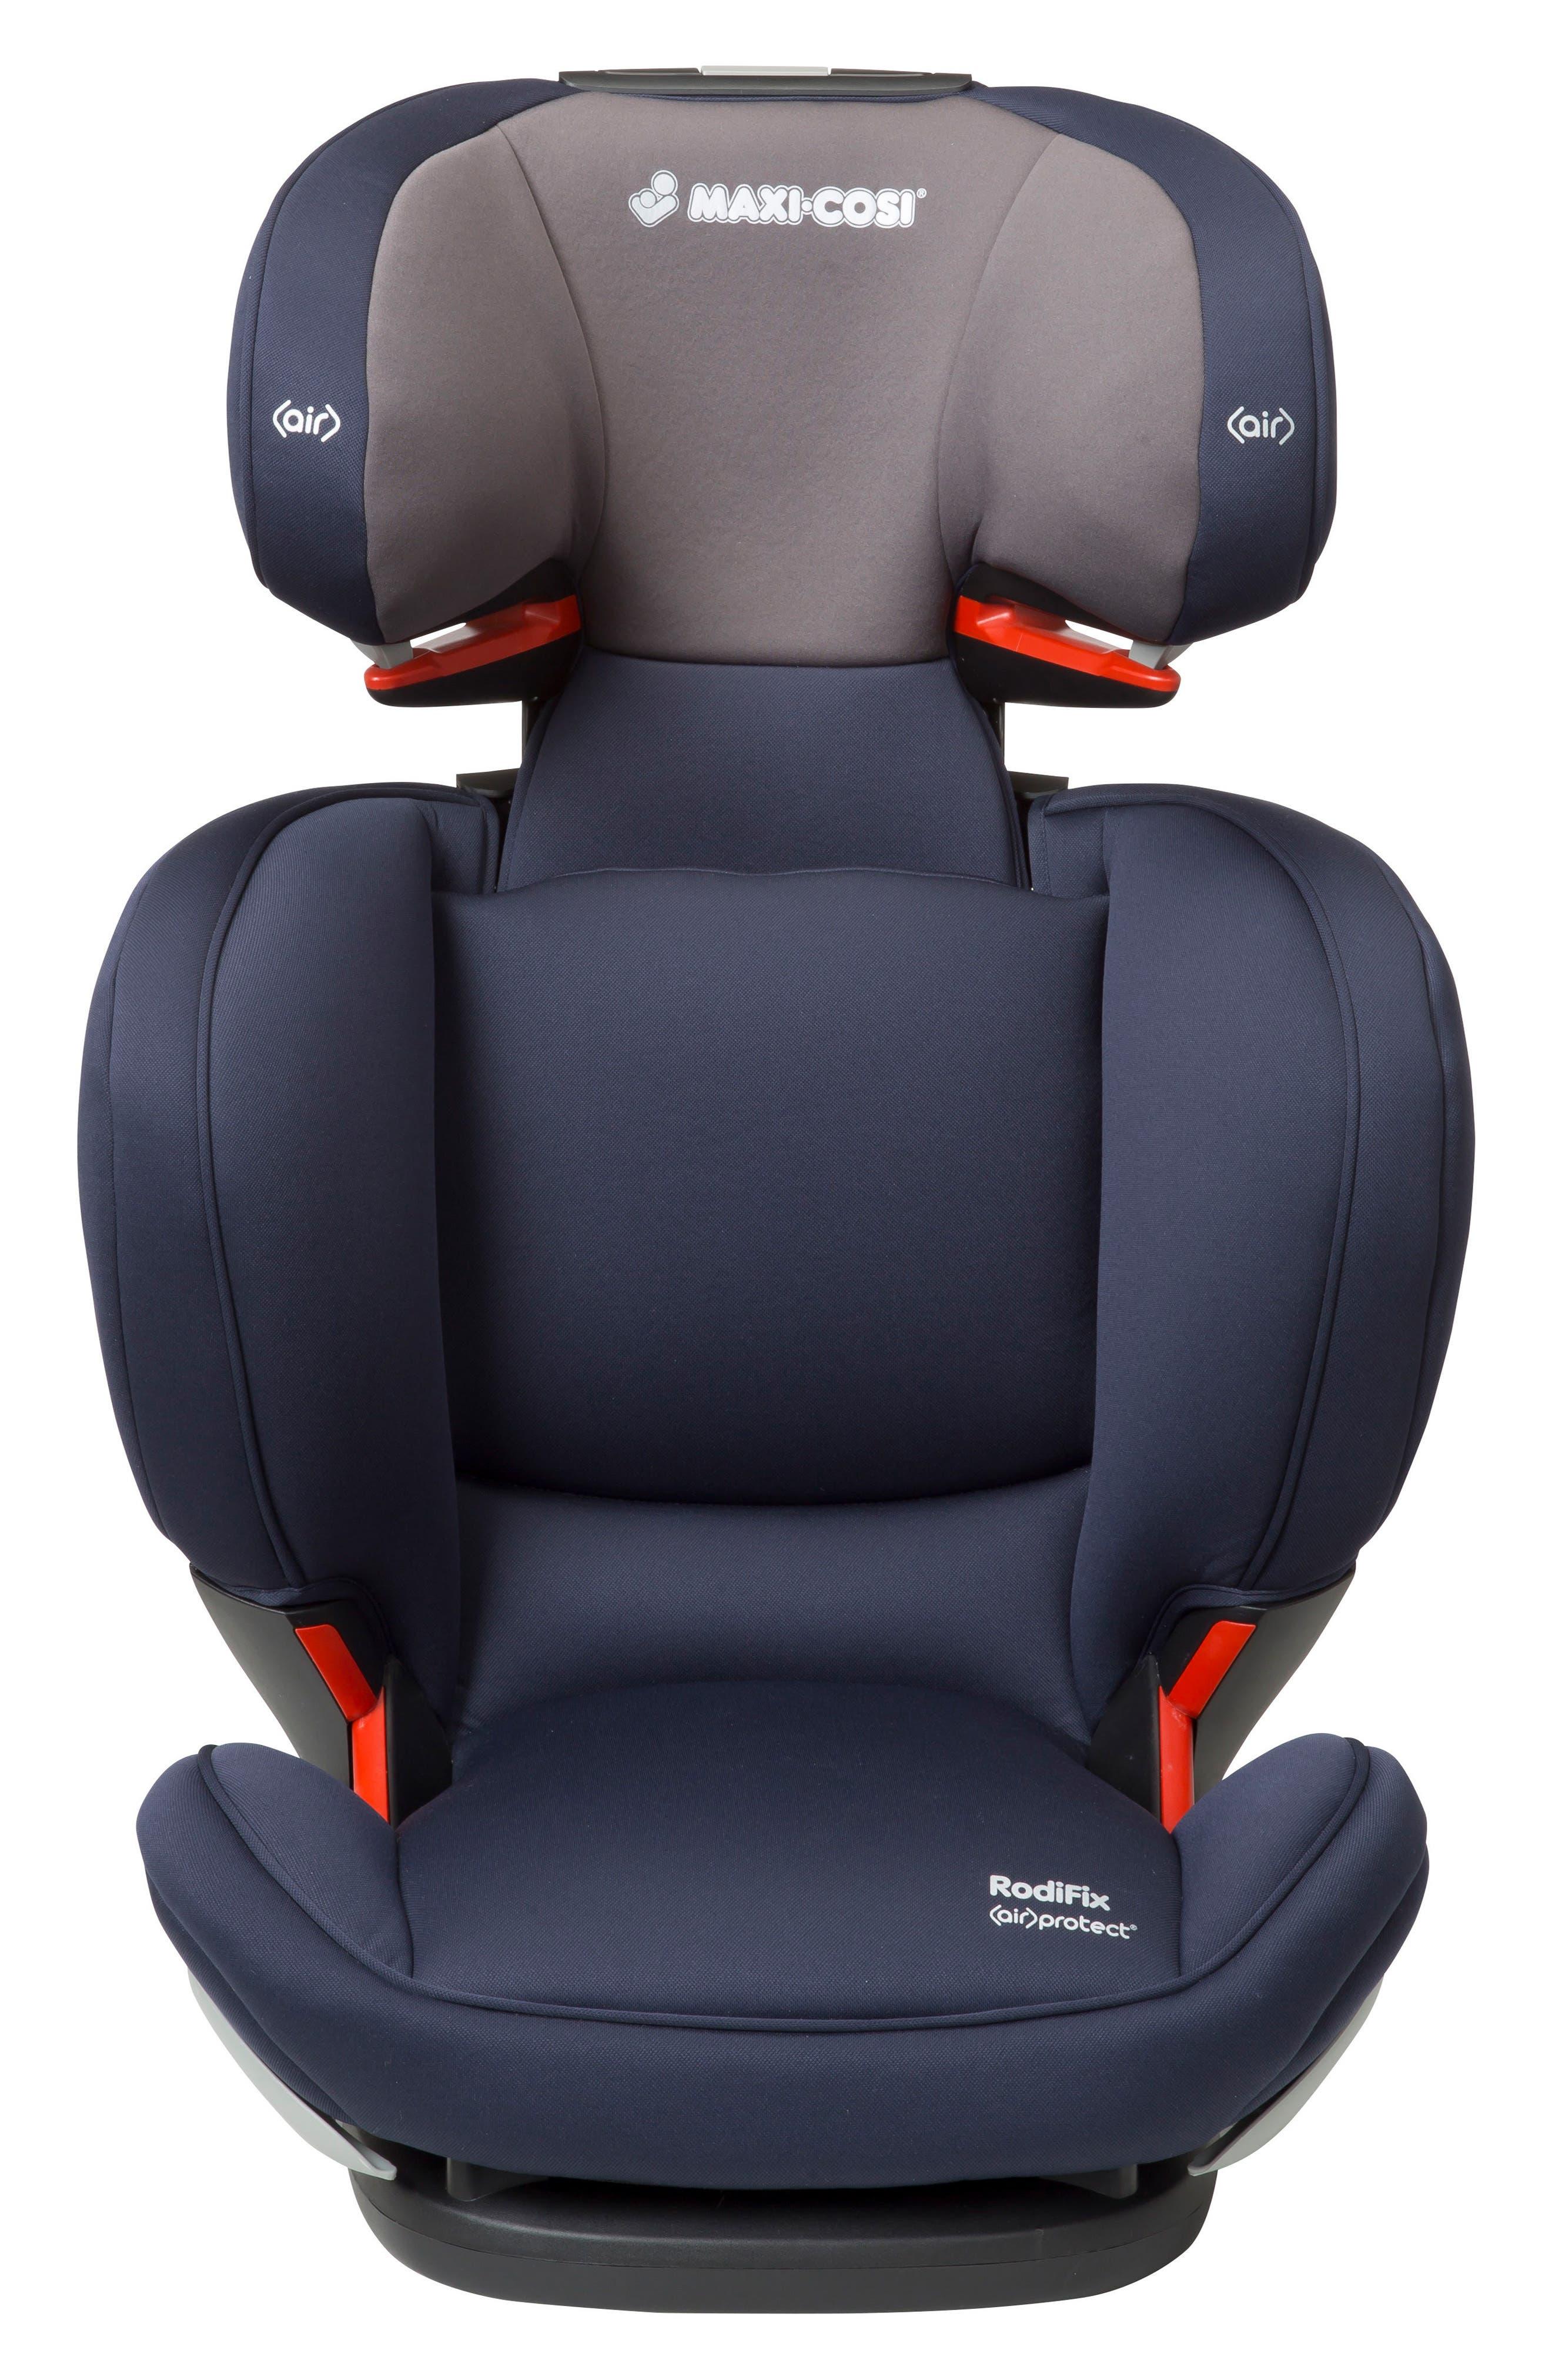 RodiFix Booster Car Seat,                         Main,                         color, 413